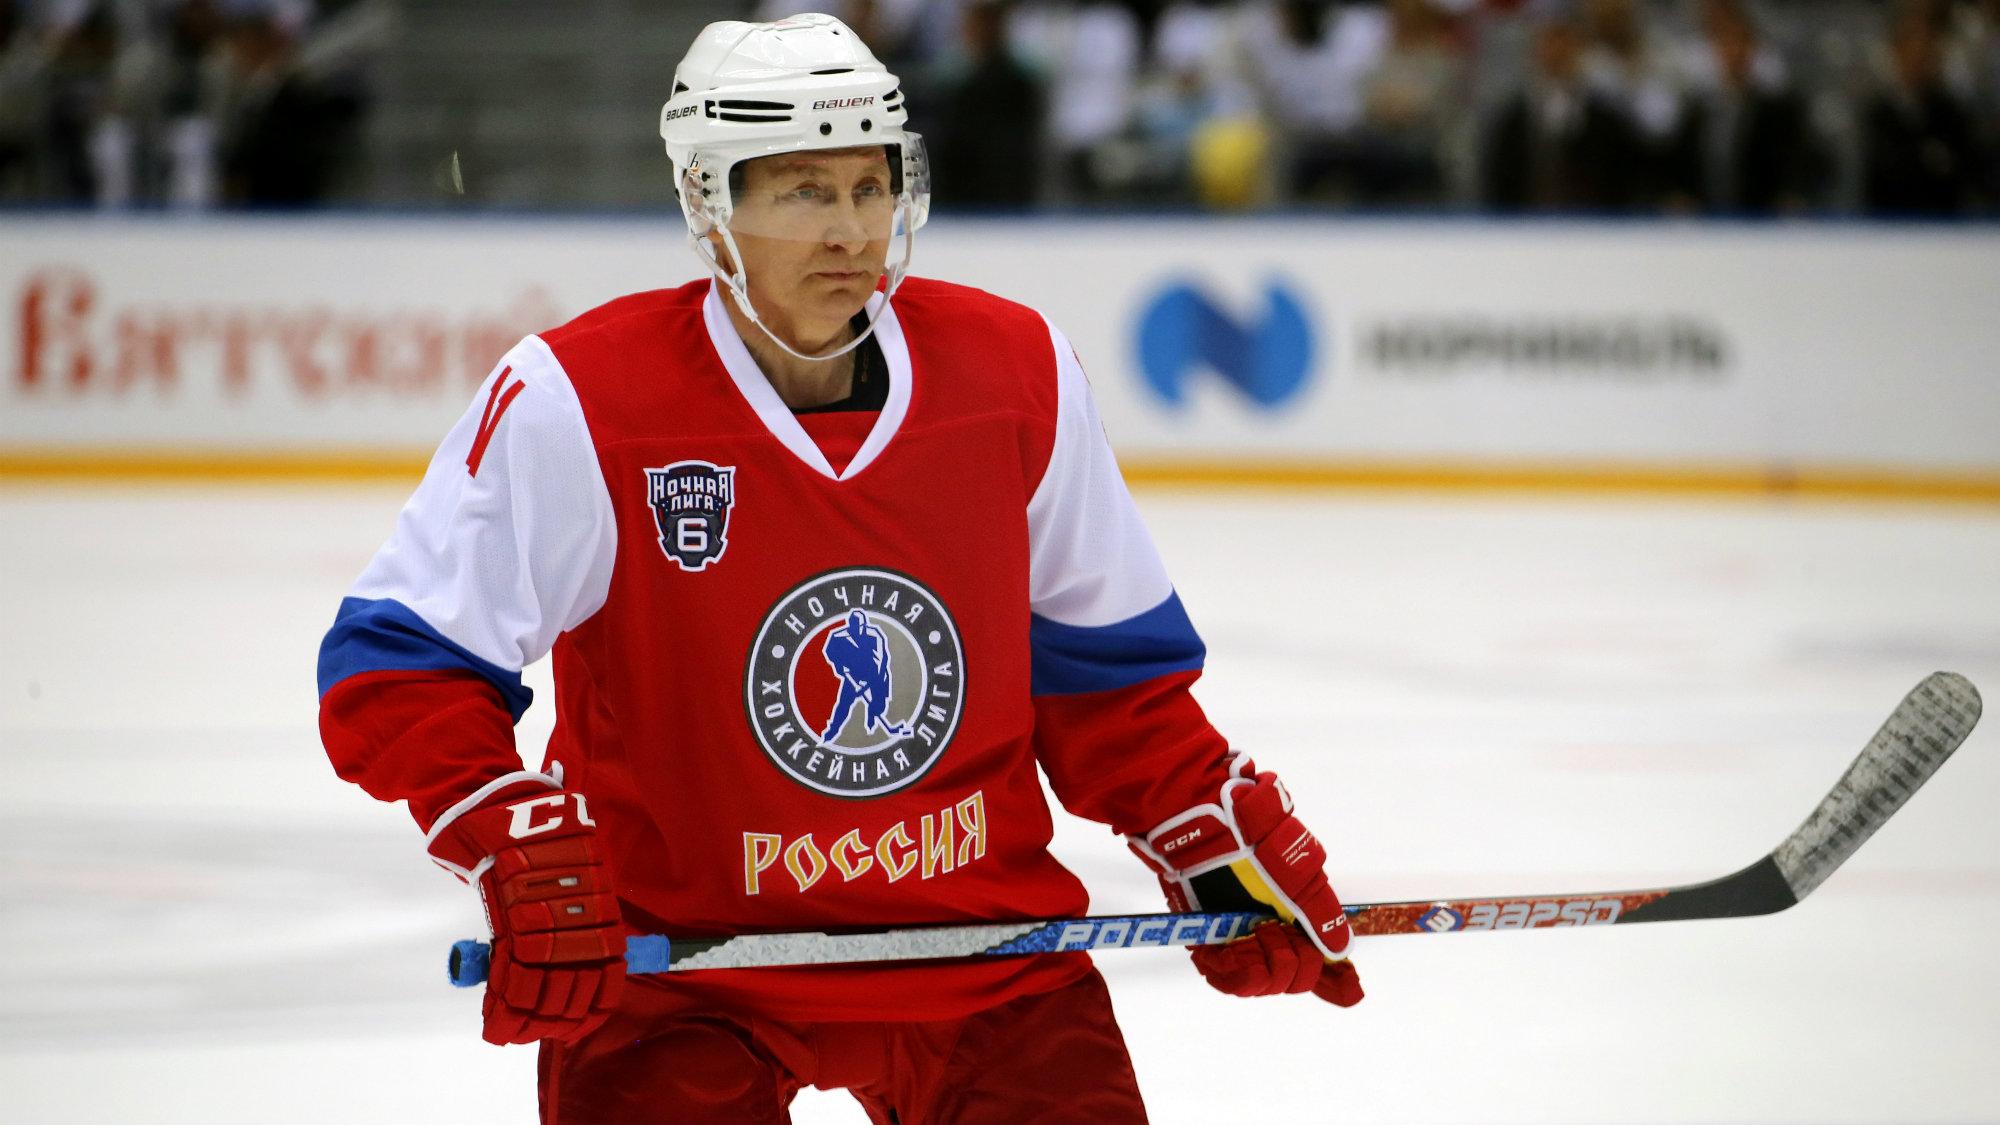 Vladimir Putin playing hockey